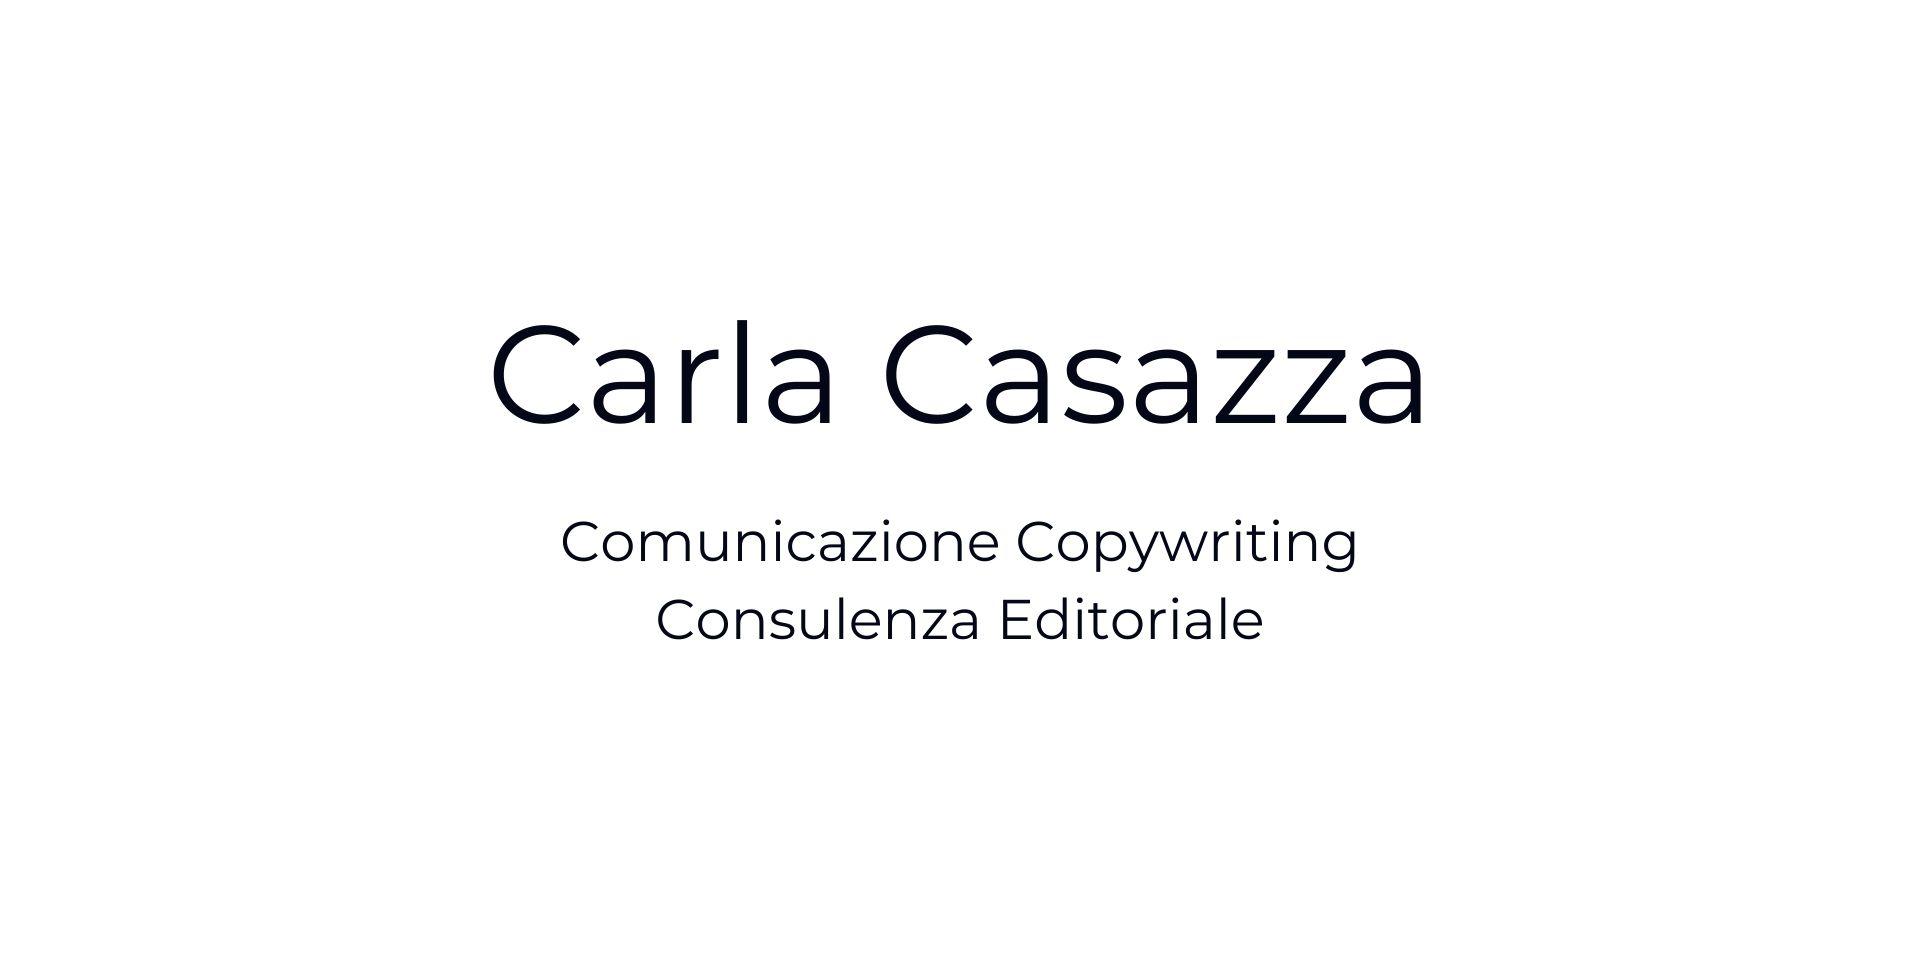 Carla Casazza